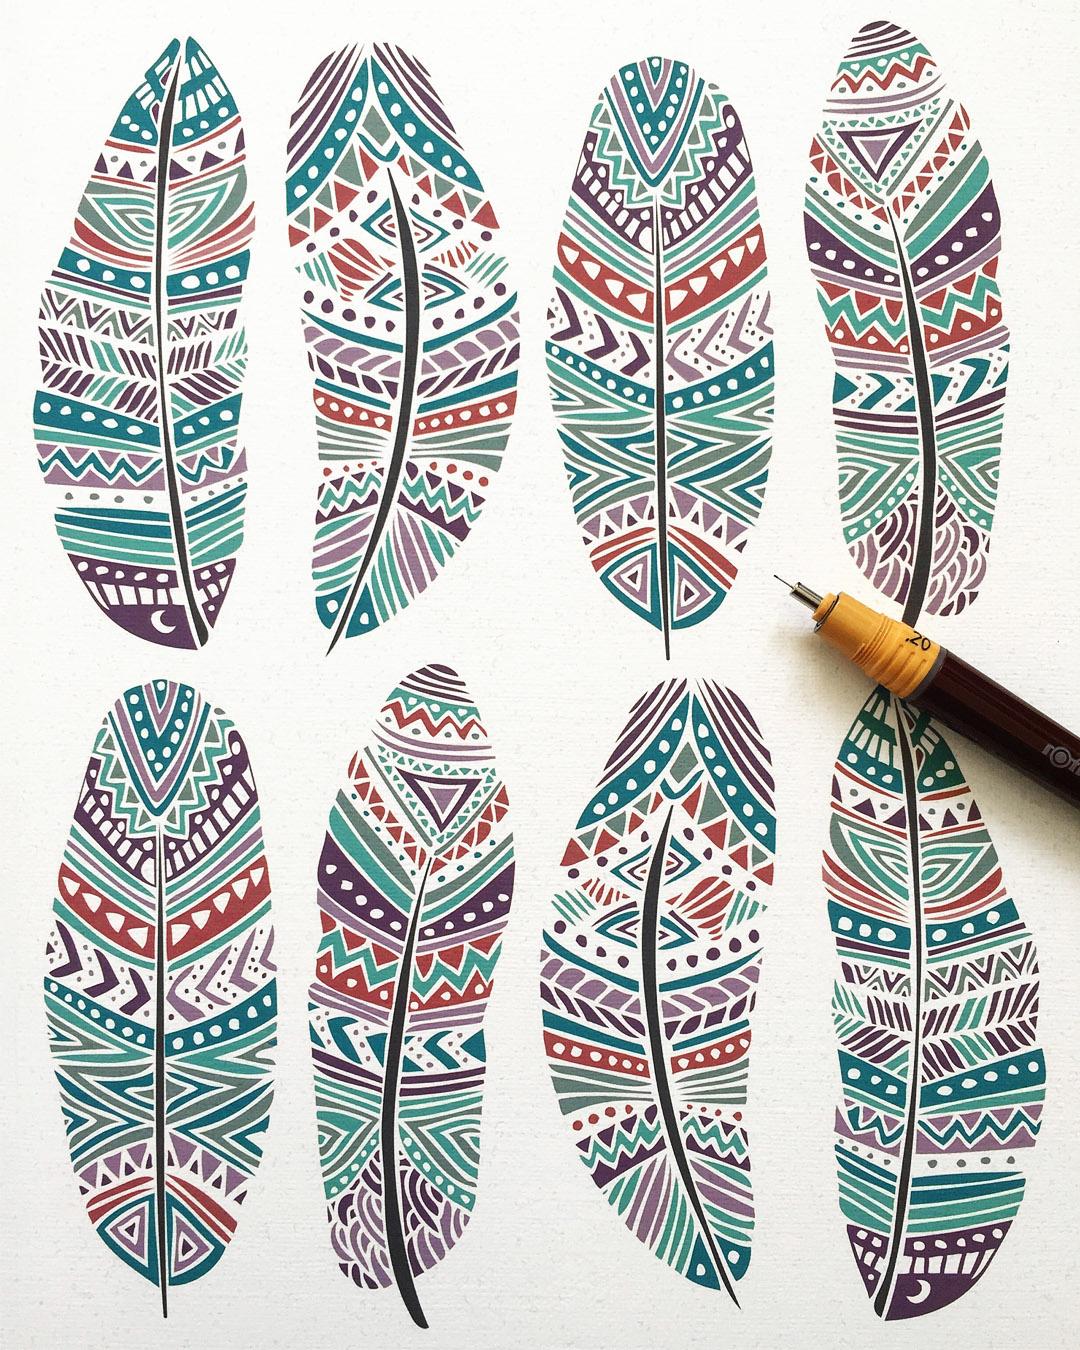 Tribal ethnic pattern designs on behance for Pattern design ideas